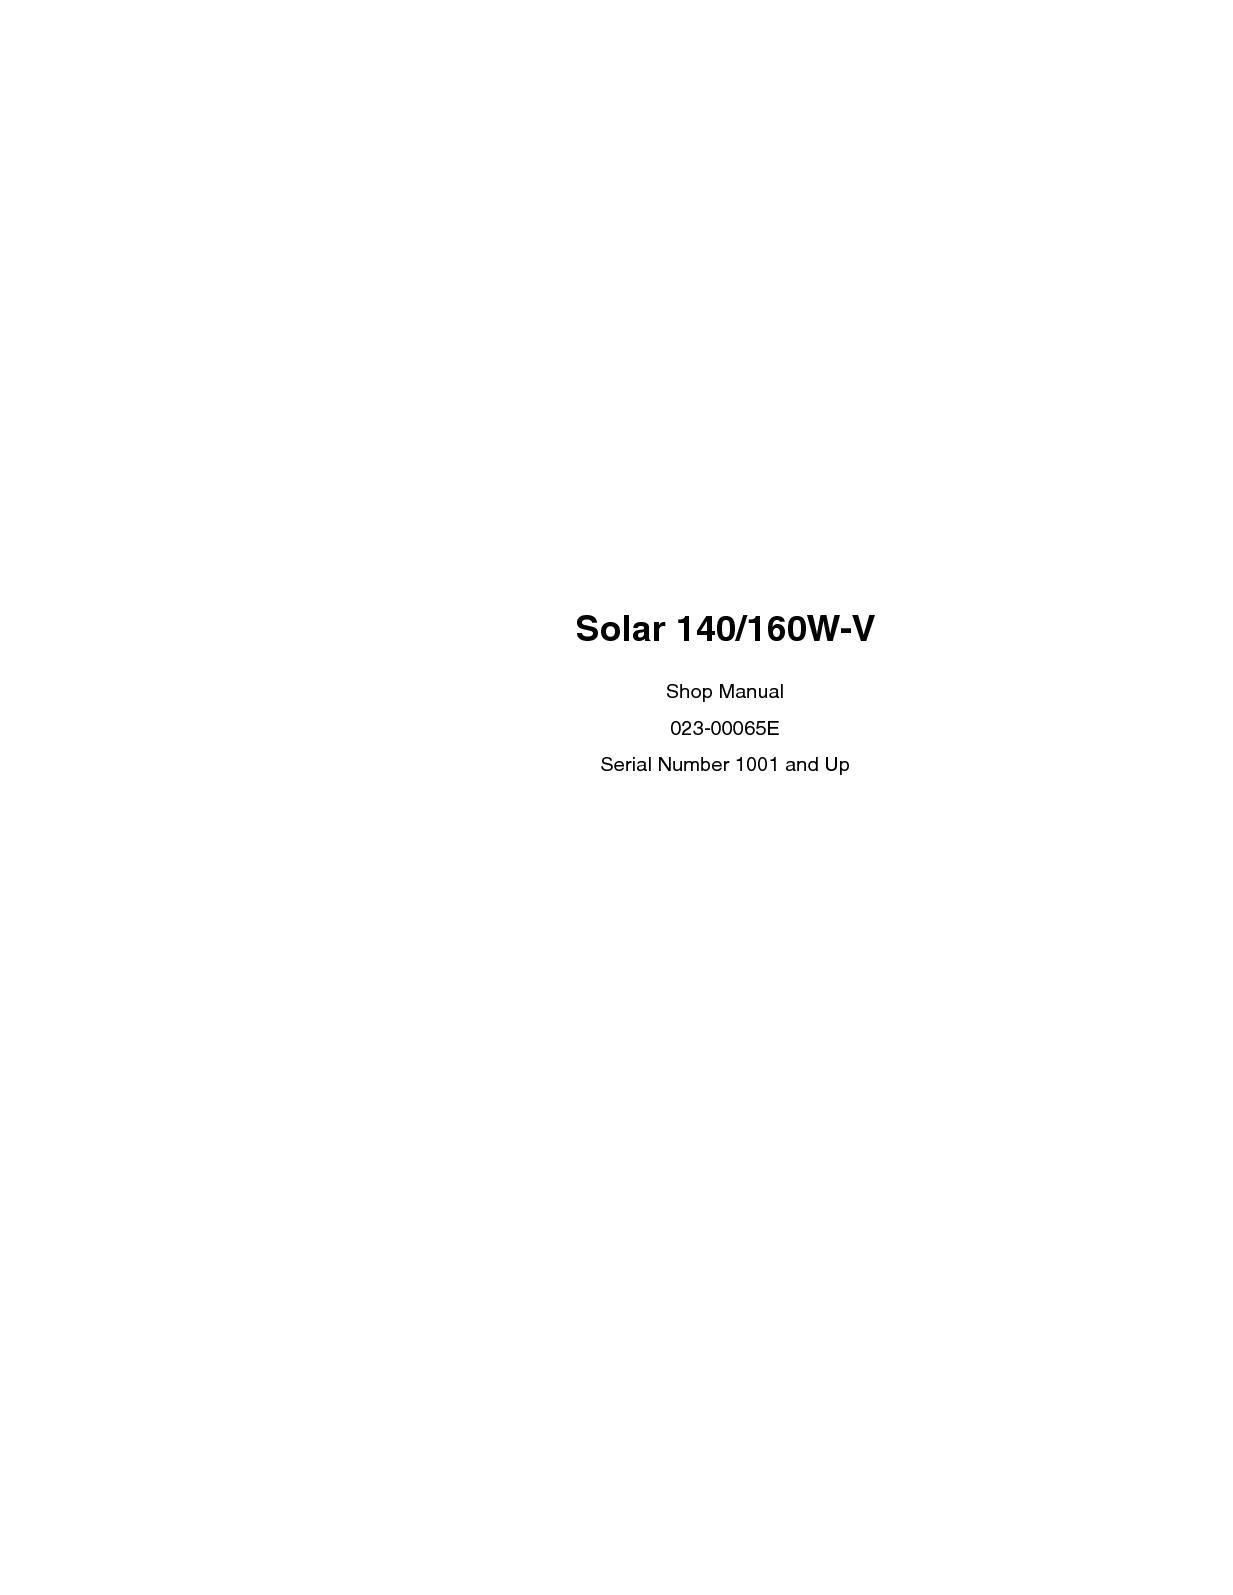 Doosan Dashboard Digram Wiring Library Bmw K1100rs Diagram Calamo Daewoo Solar 140w V Wheel Excavator Service Repair Manual